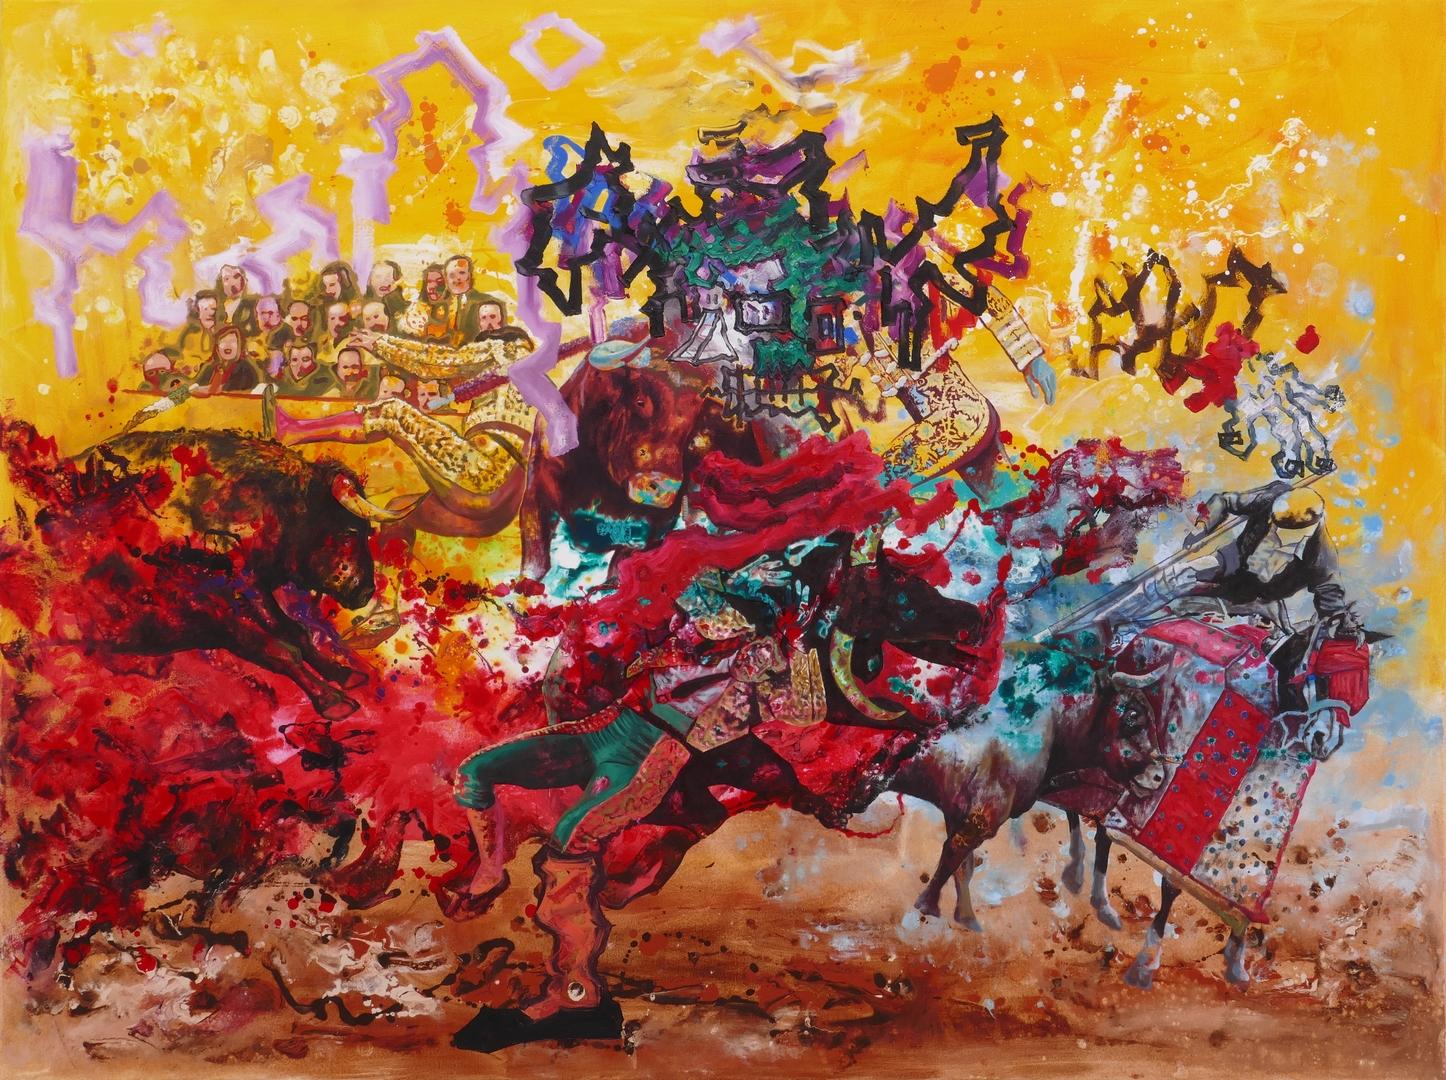 B, Der rote Pirat VII,150x200cm, Öl, Acryl,2021